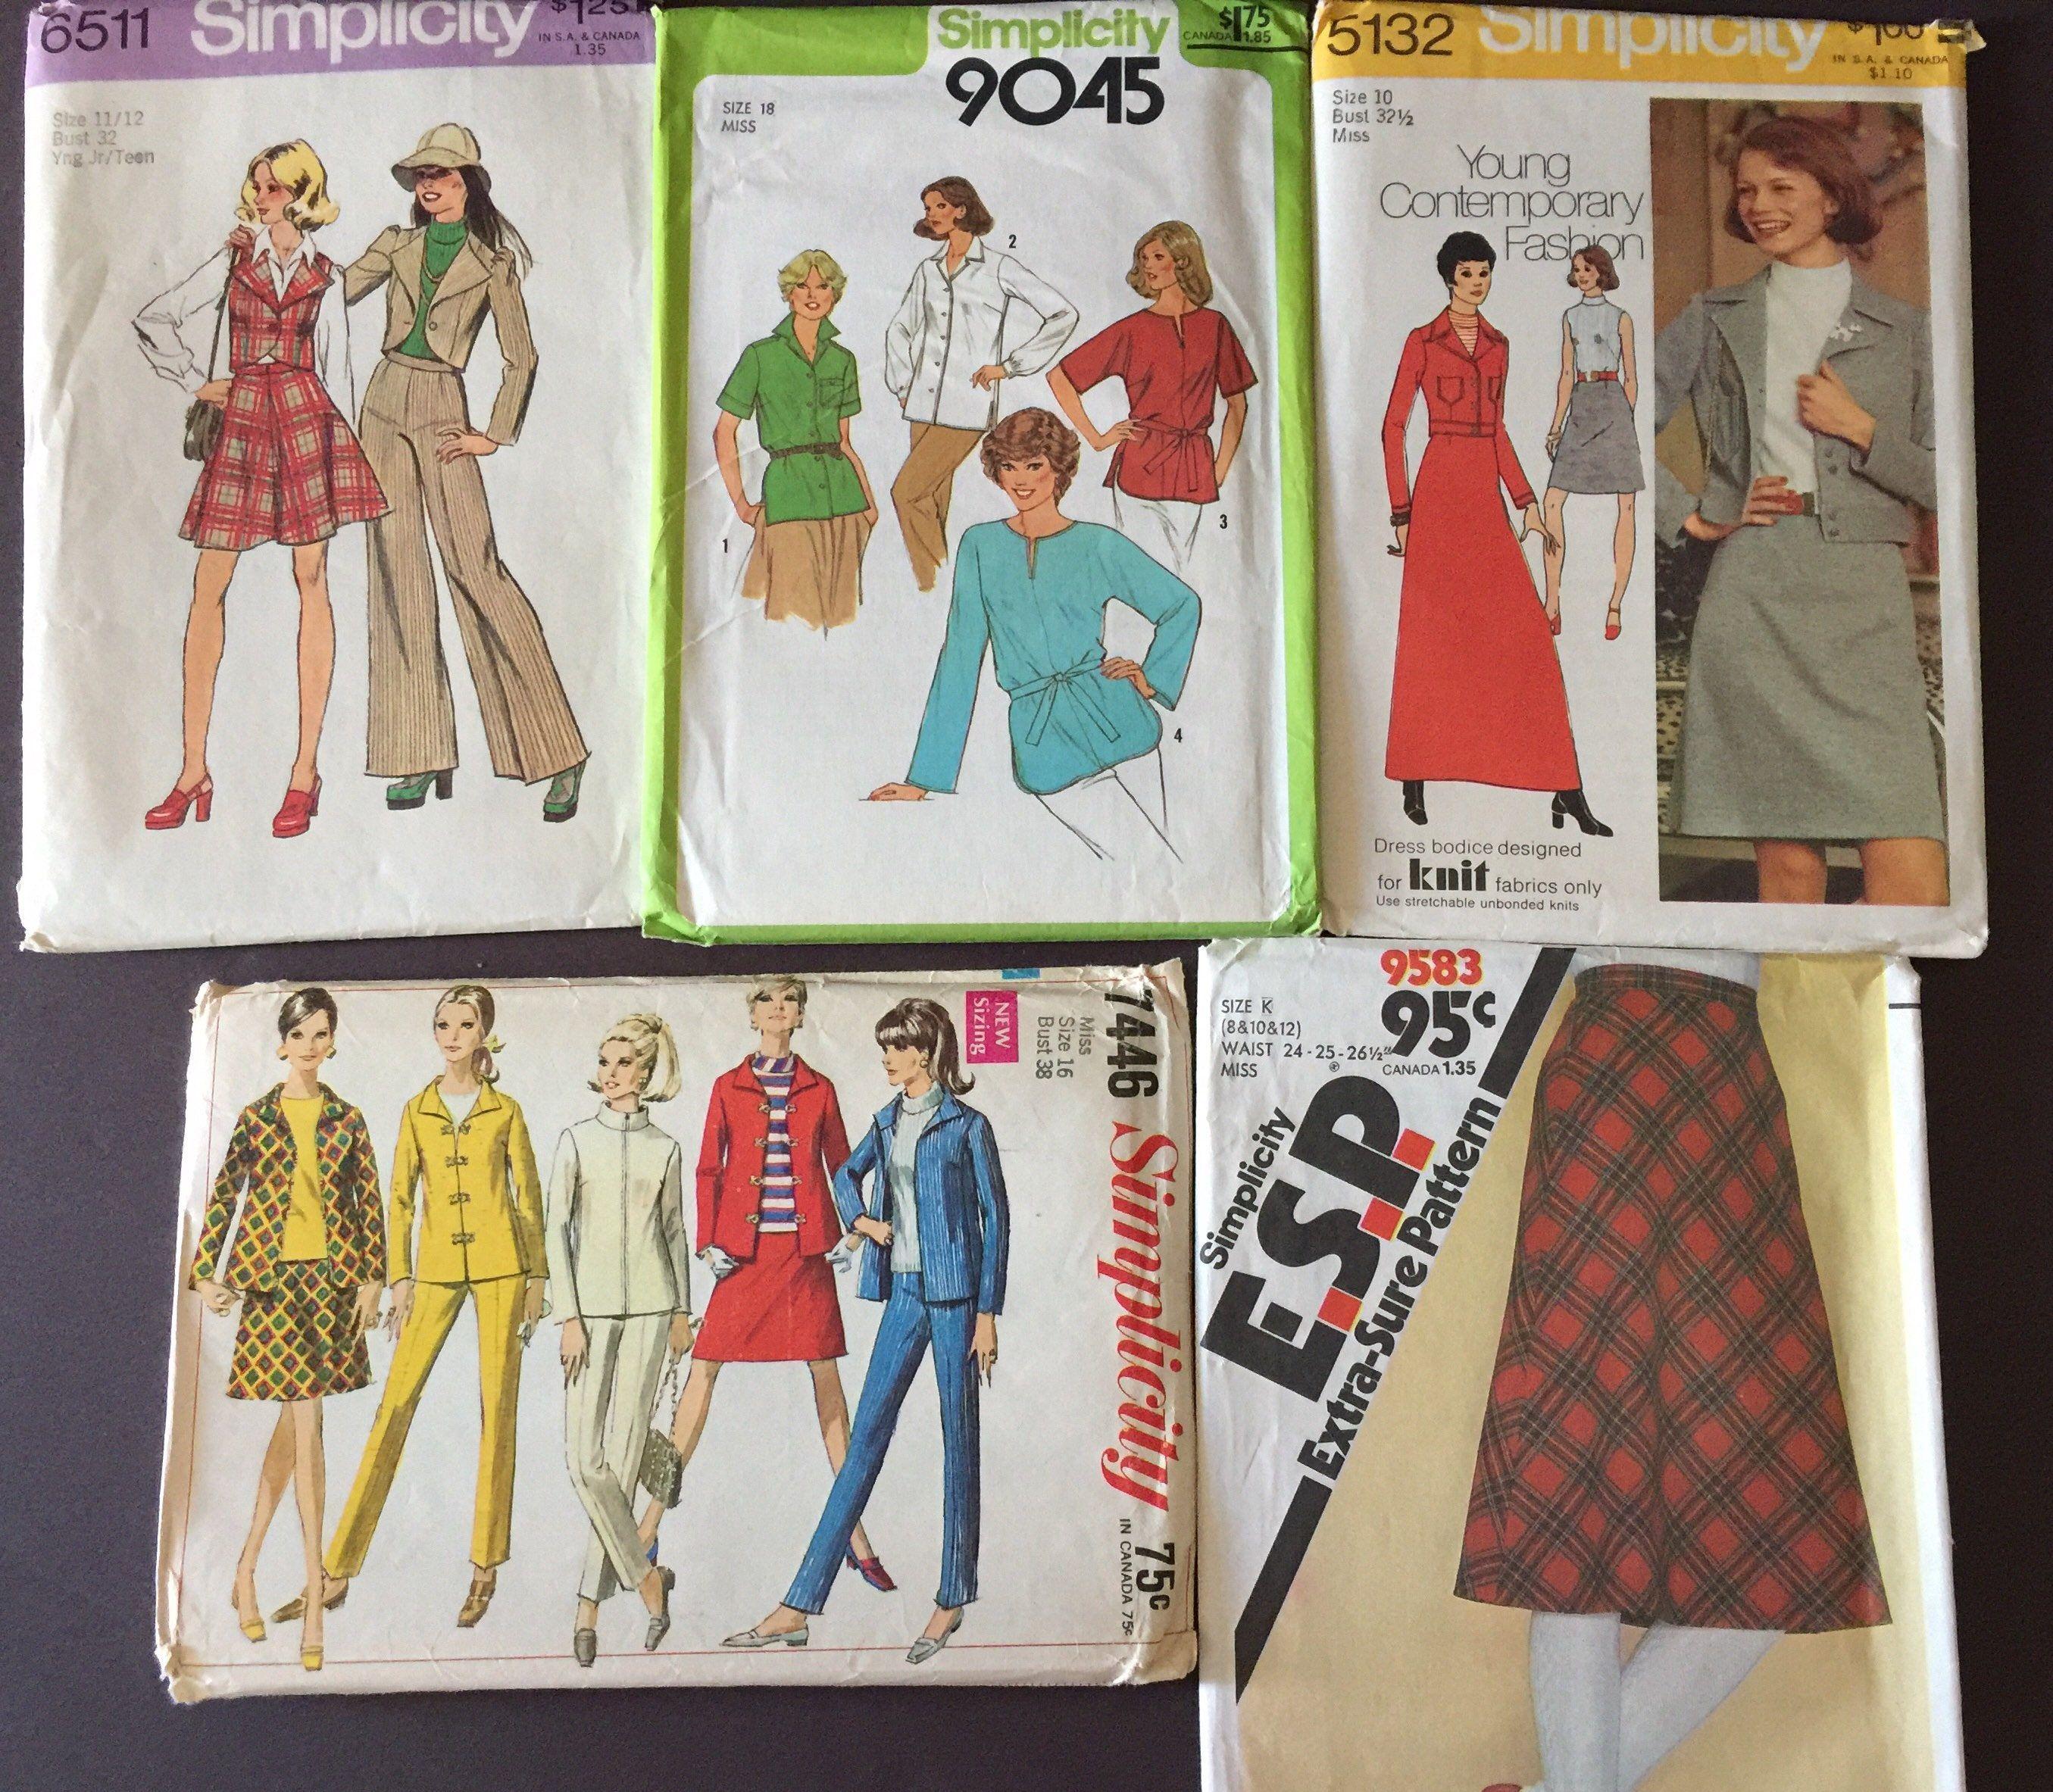 ff5ec64daf7c3 Vintage simplicity pattern, lot 5, size 8, 18, skirt, contemporary ...